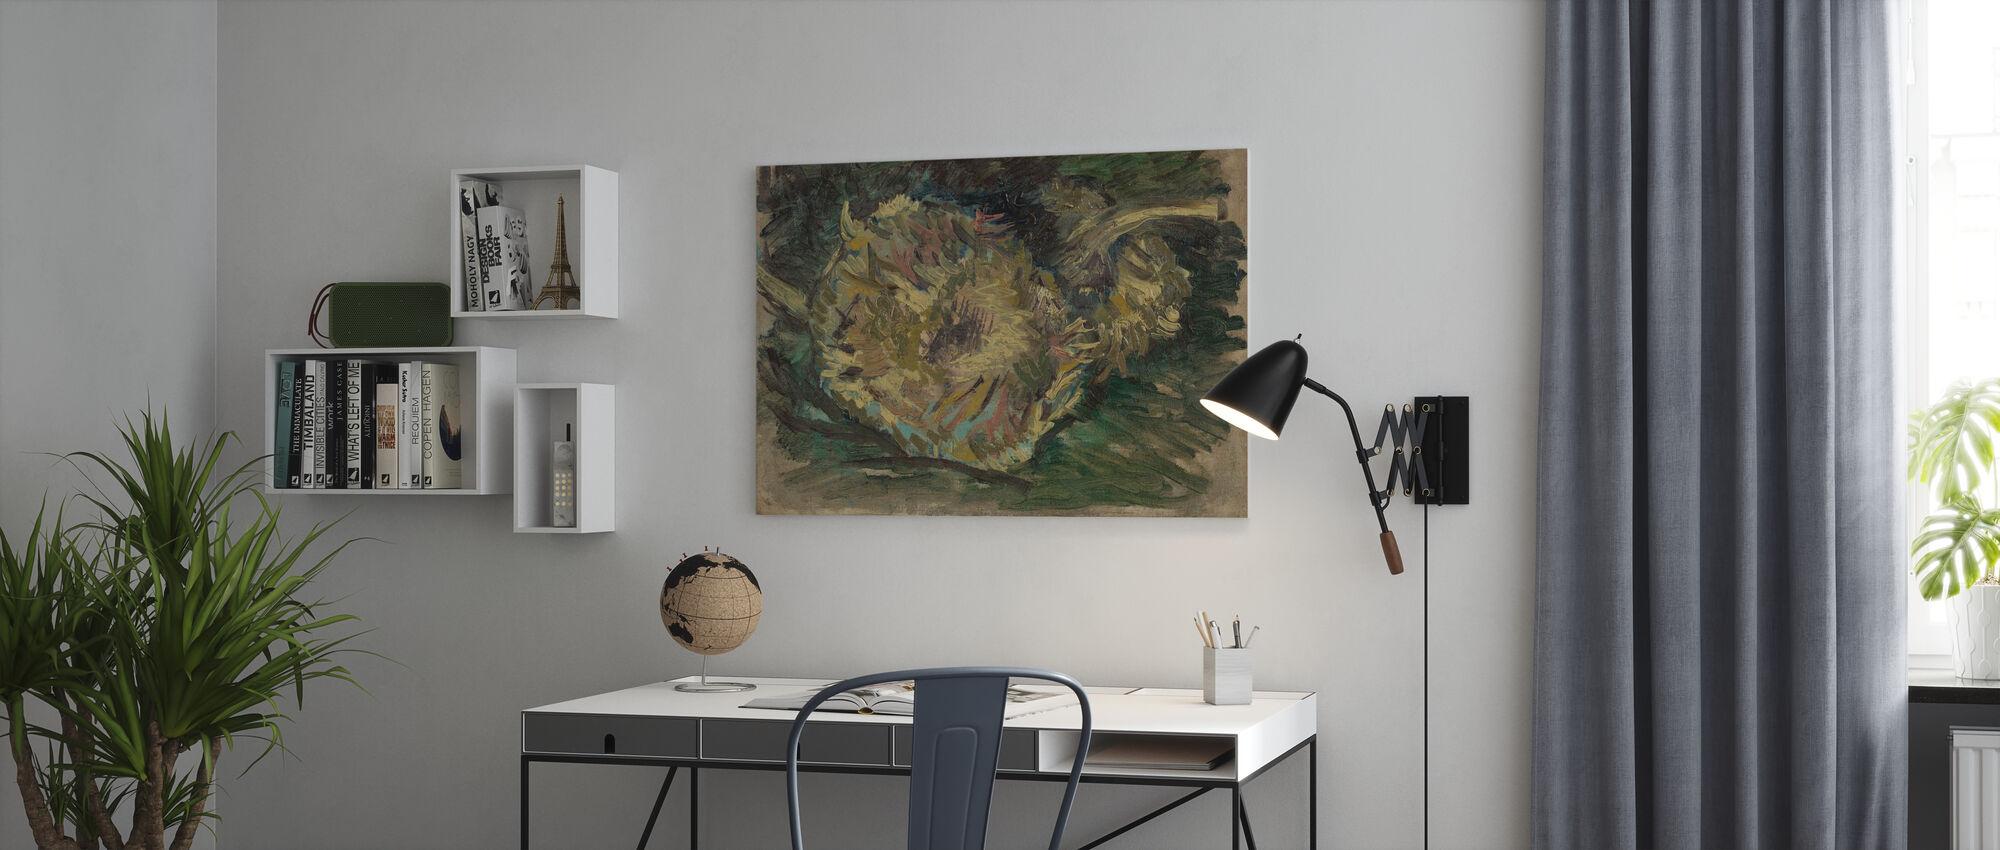 Two Cut Sunflowers - Vincent Van Gogh - Canvas print - Office